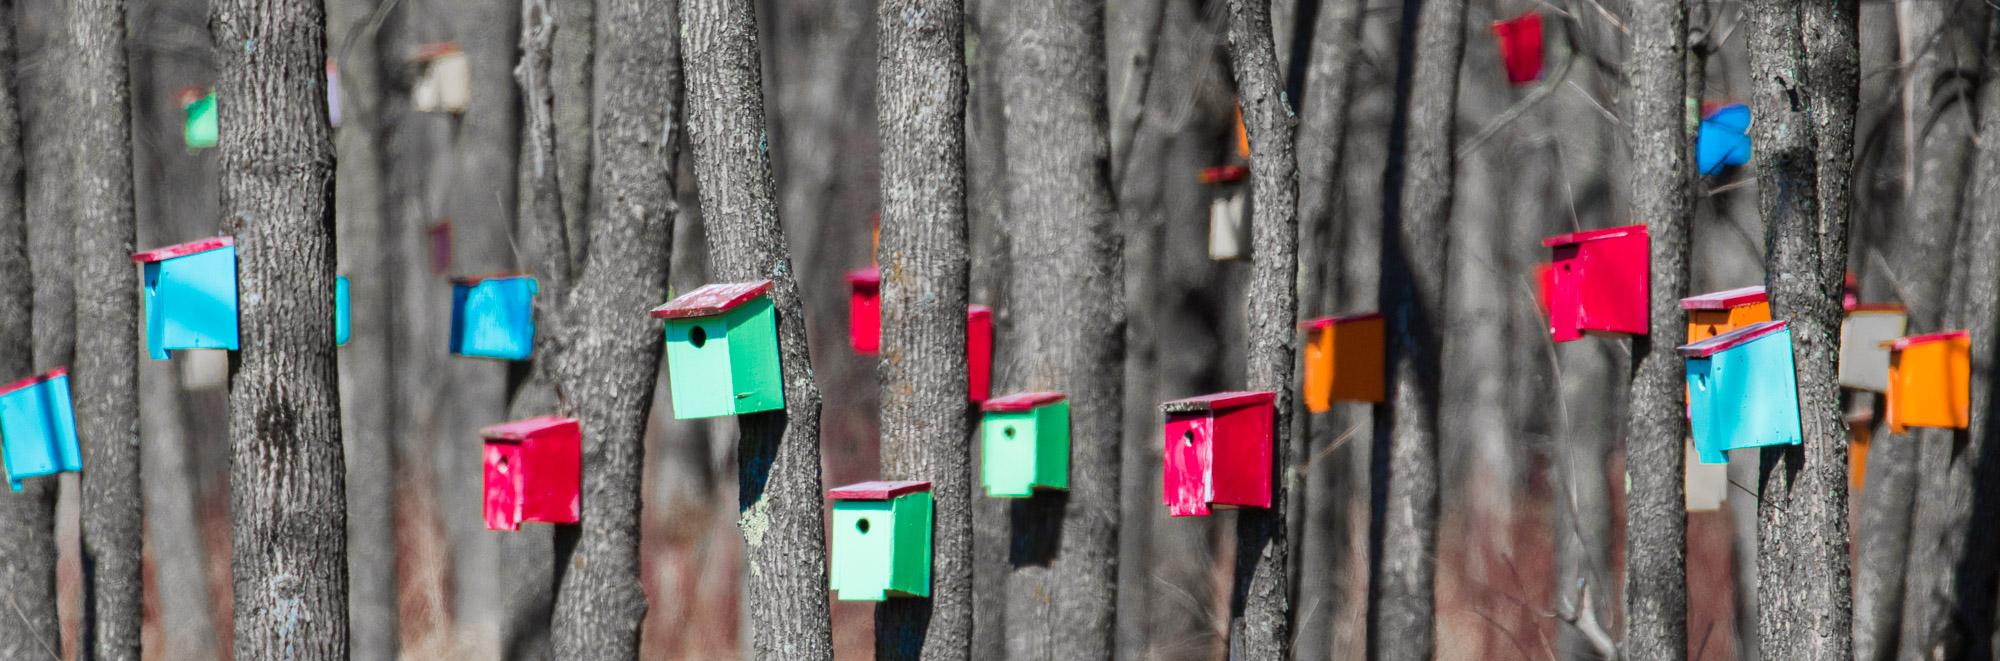 multicolored bright bird house panorama